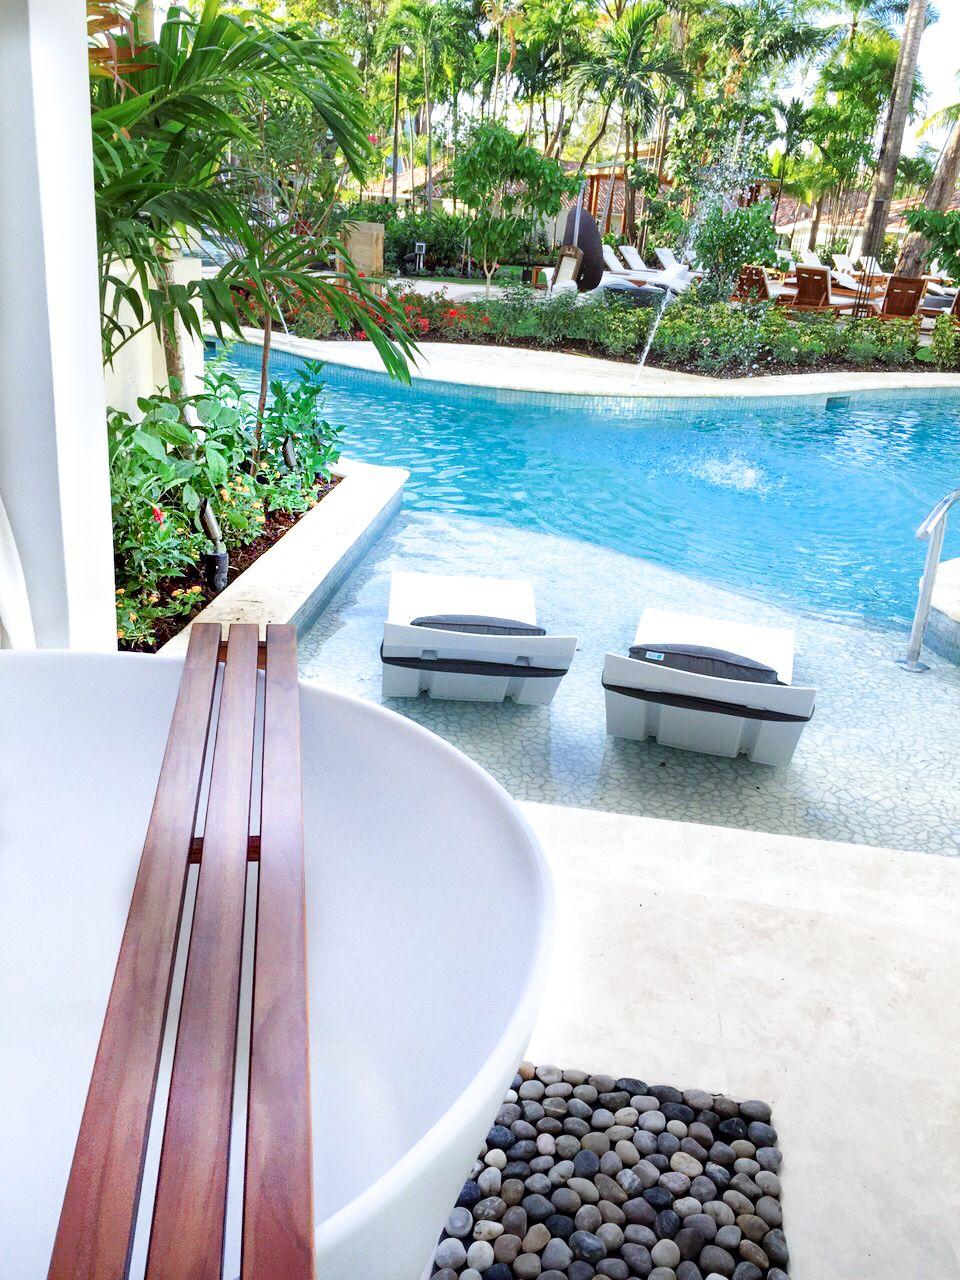 Swim-up suites at Sandals Barbados #sandals #romance #barbados #honeymoon #caribbean